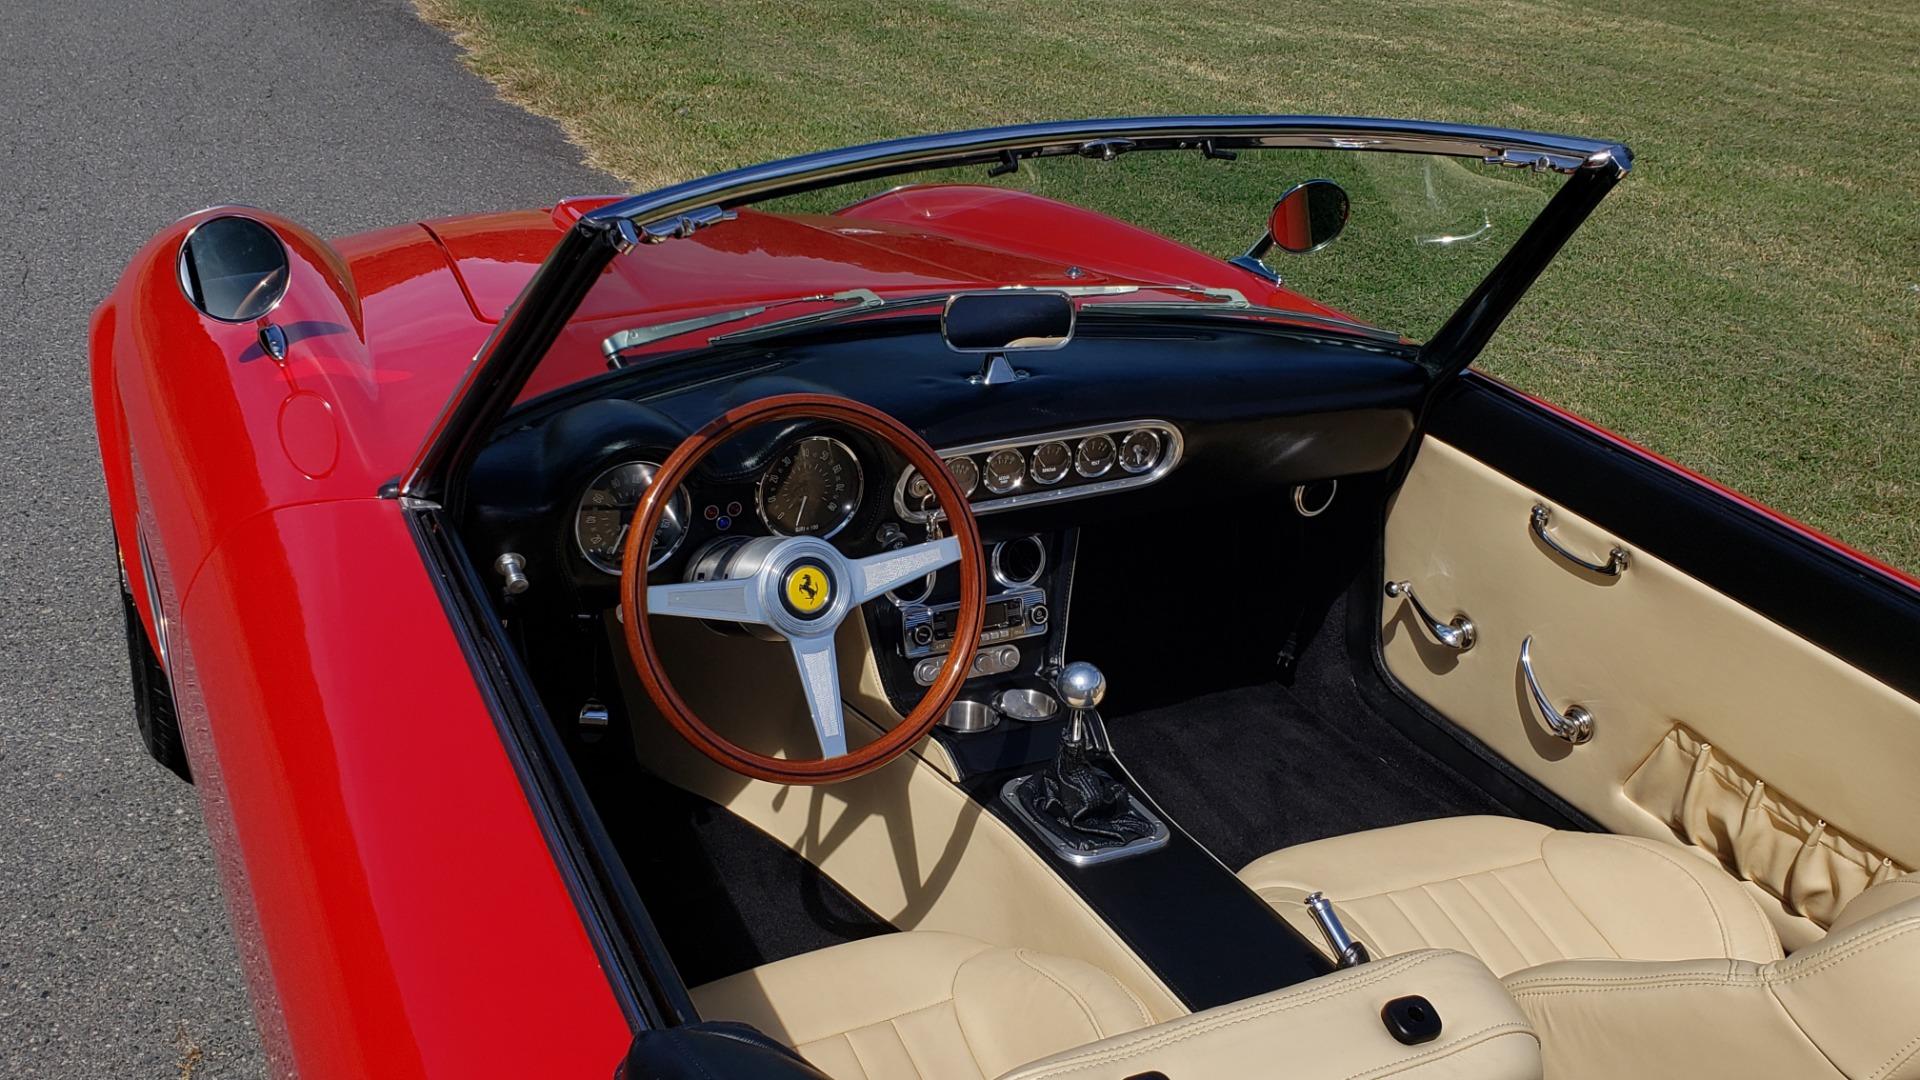 Used 1961 Ferrari 250GT SWB CALIFORNIA REPLICA / 302CI V8 / TREMEC 5-SPEED for sale Sold at Formula Imports in Charlotte NC 28227 18